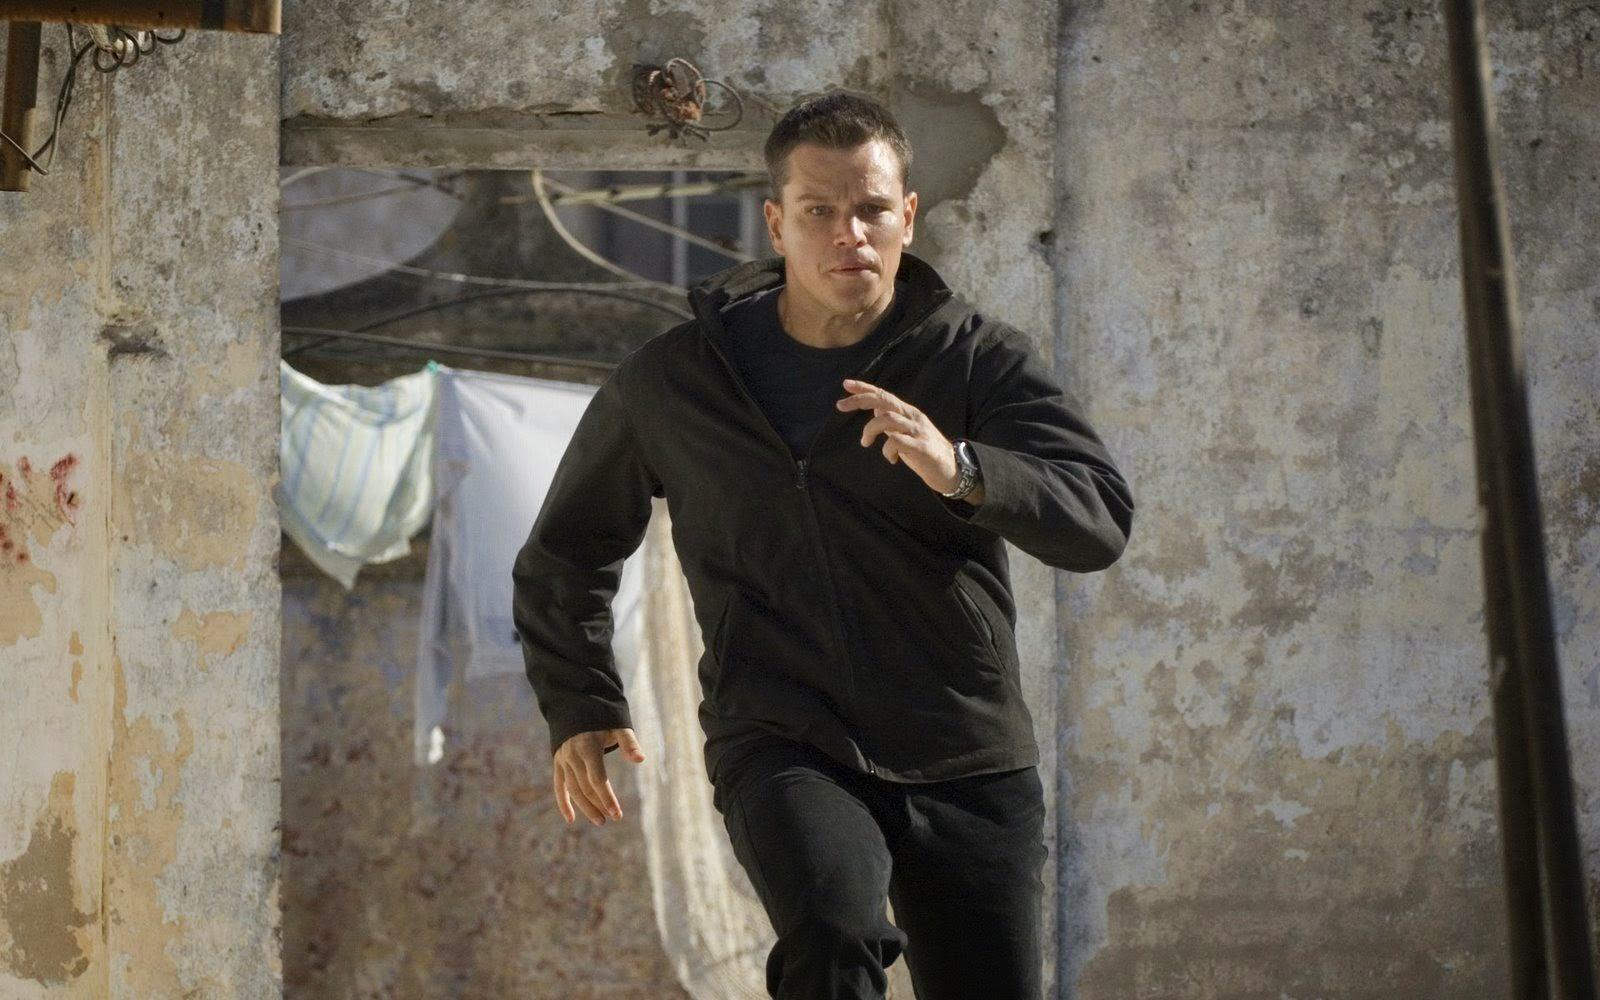 The Ace Black Movie Blog Movie Review The Bourne Ultimatum 2007